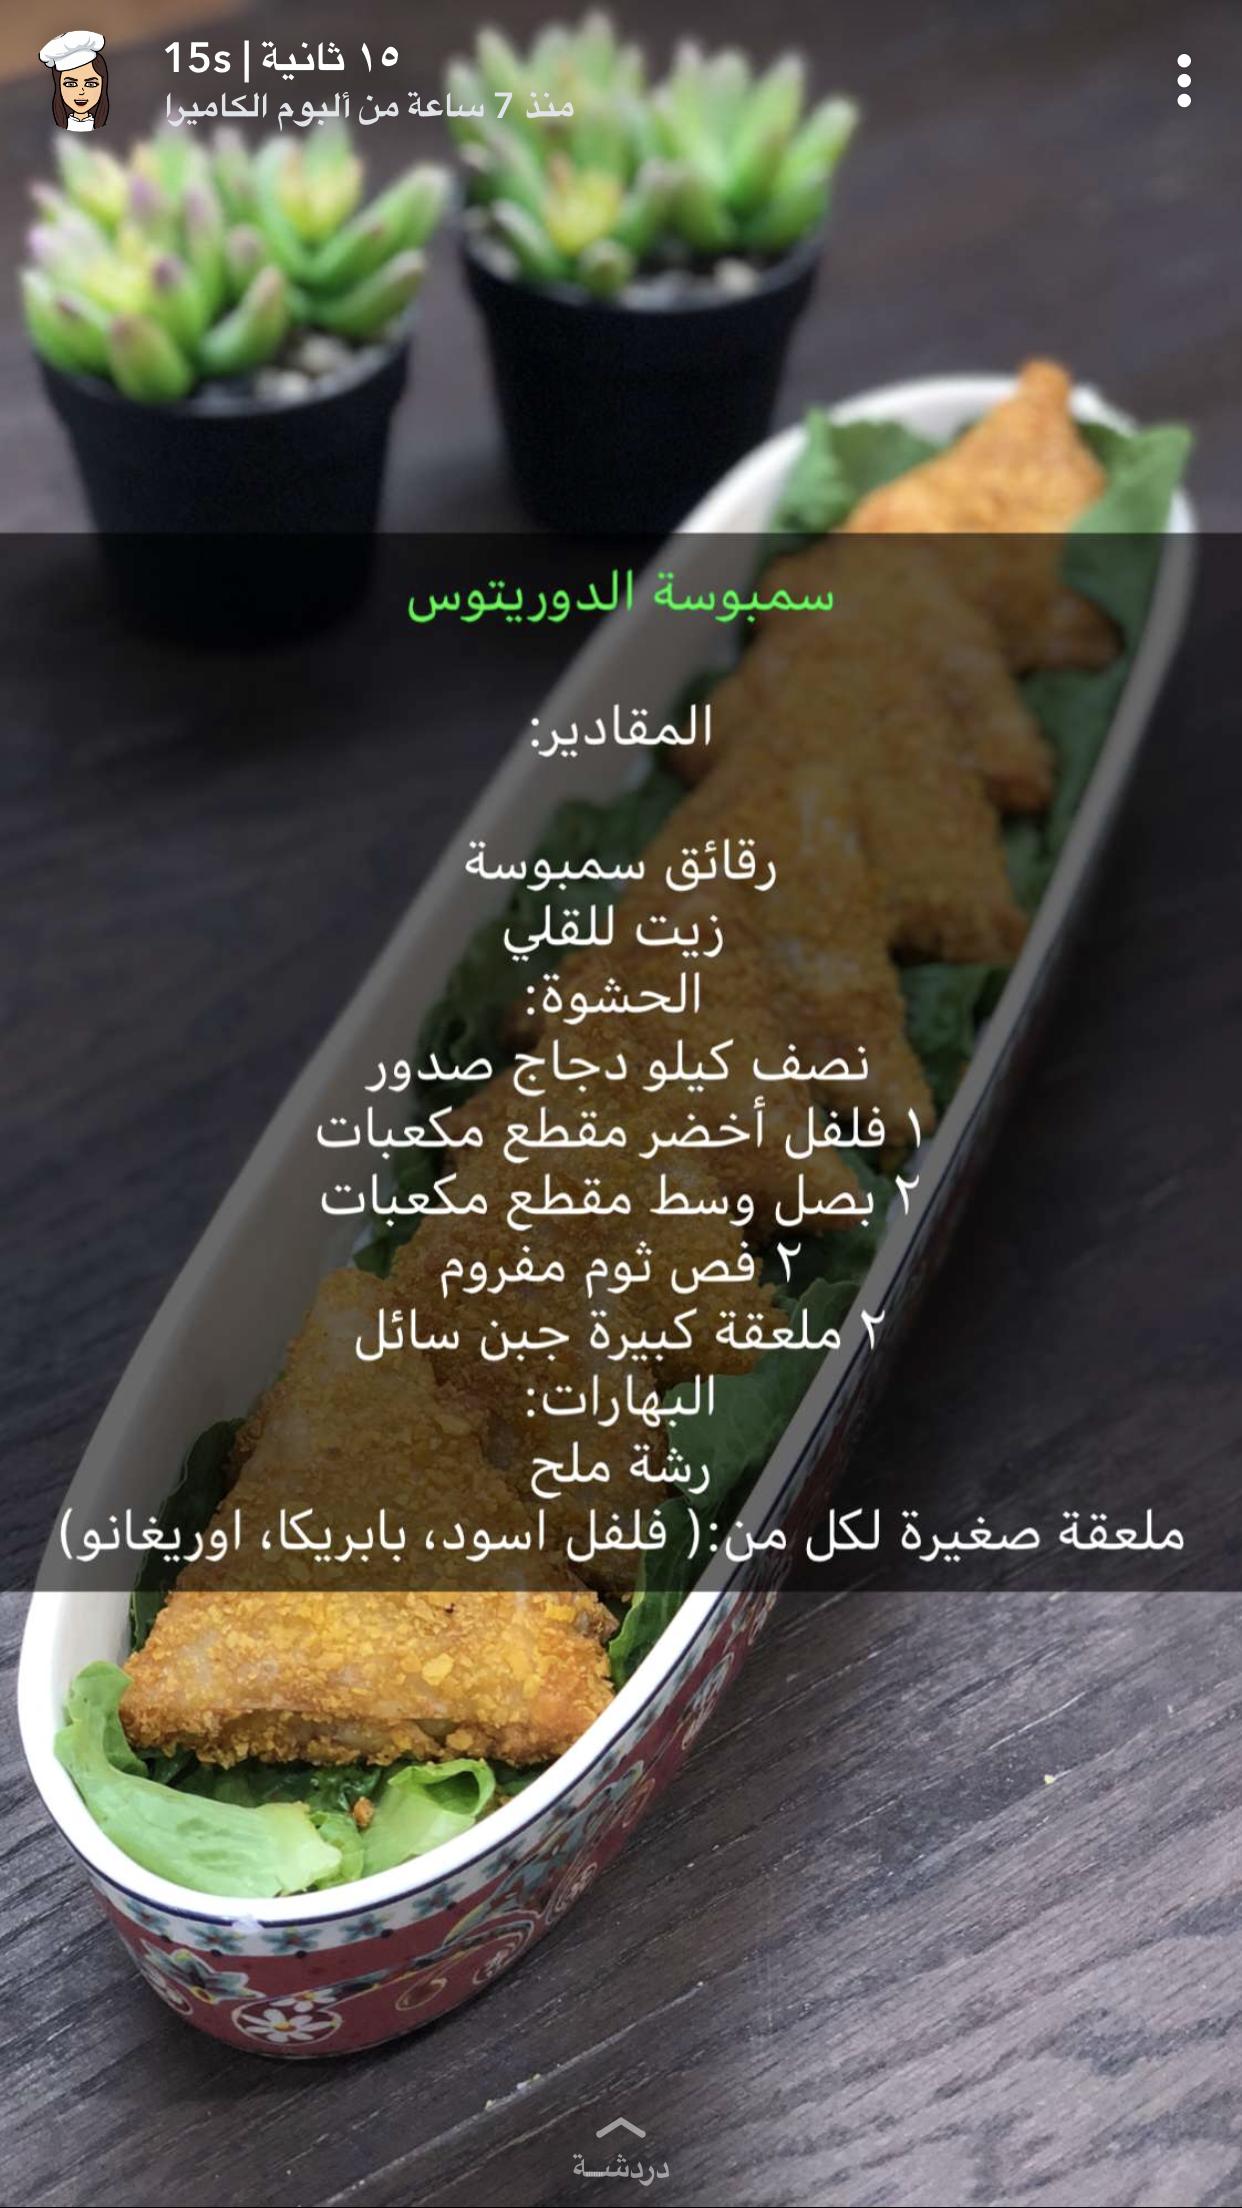 Pin By Khokha Alshahrani On أكلات منوعه Libyan Food Food Receipes Cooking Recipes Desserts